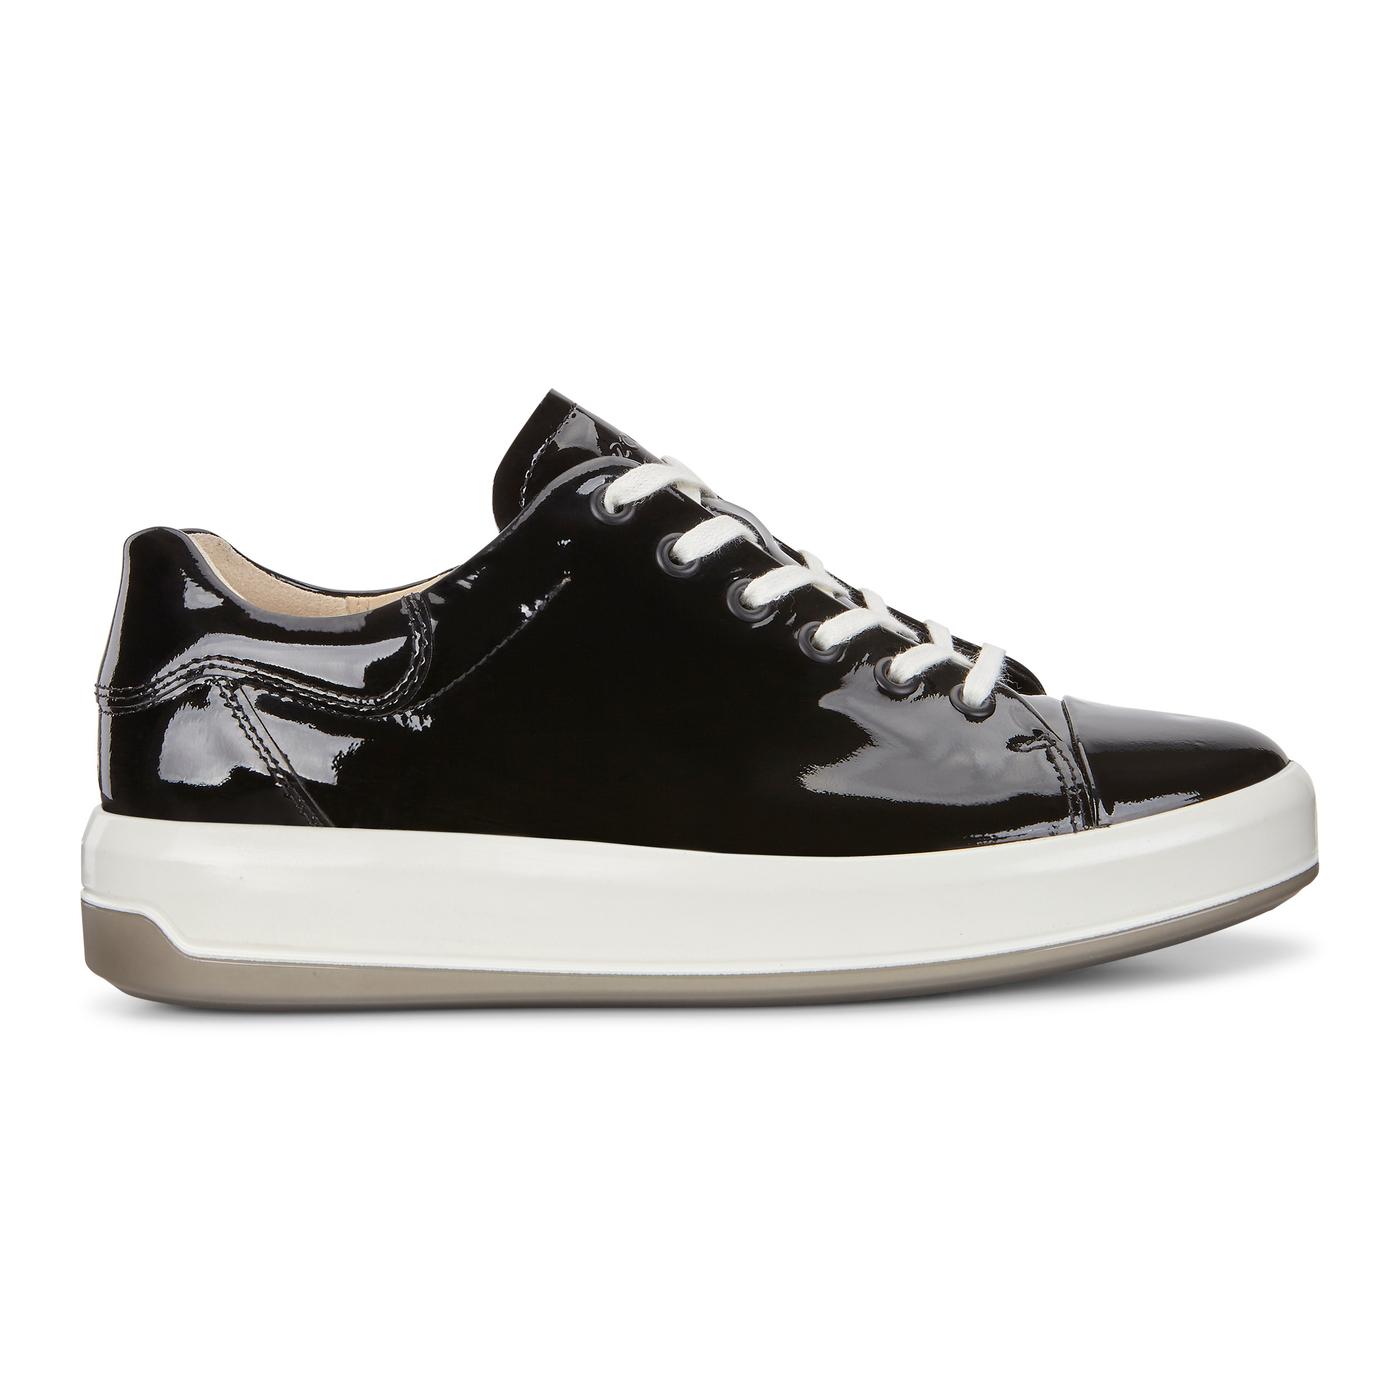 ECCO SOFT9 Sneaker Tie